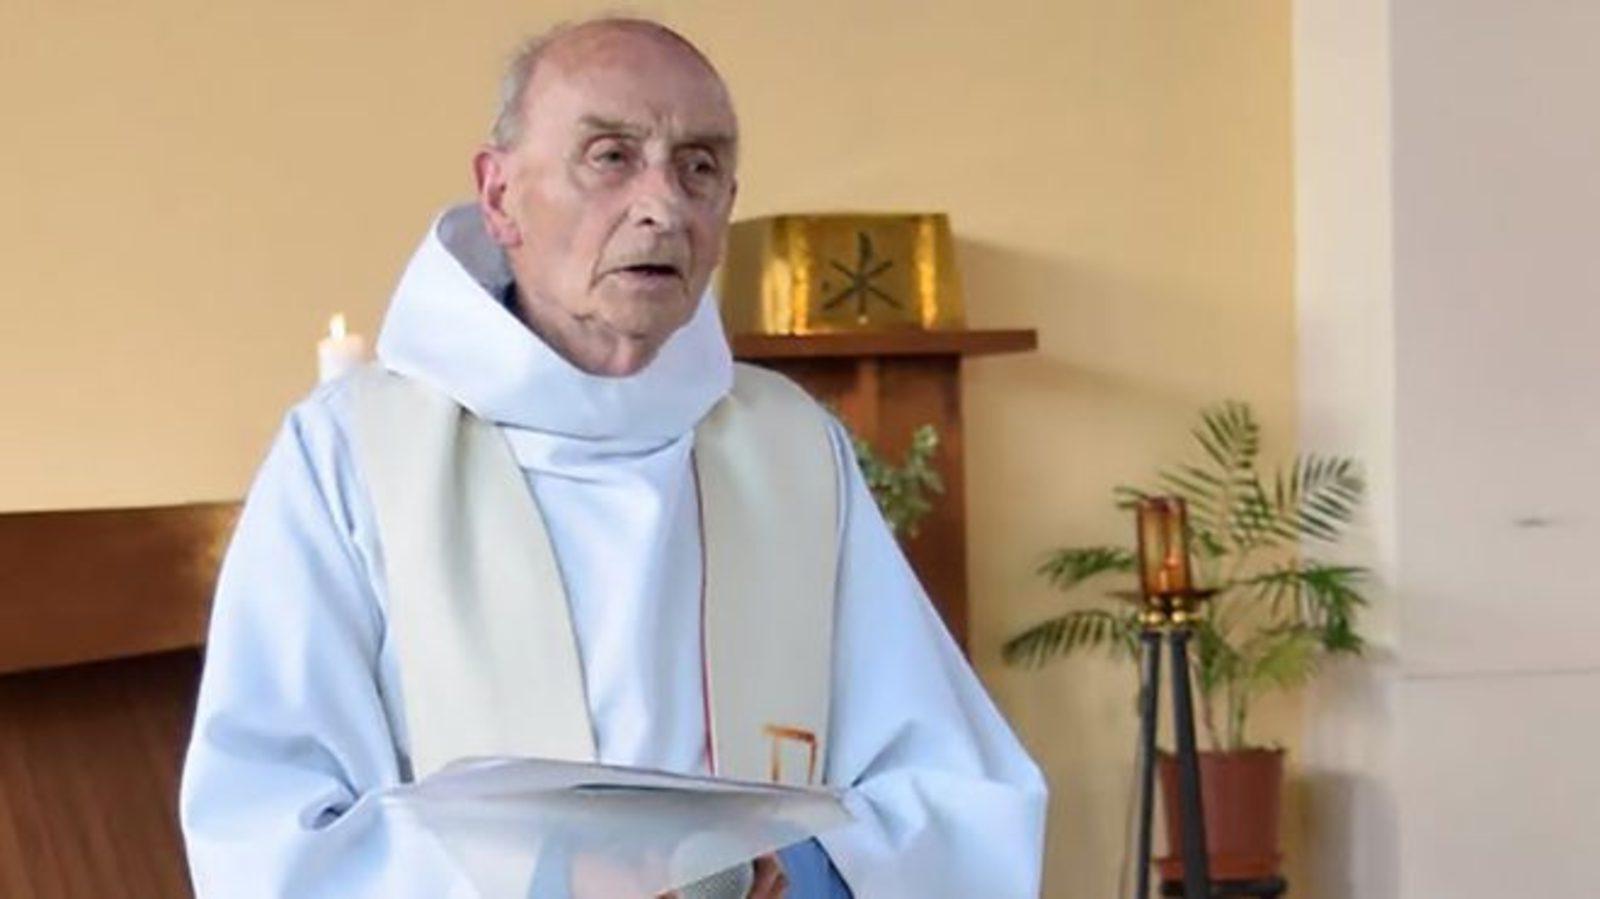 Pater-Jacques-Hamel